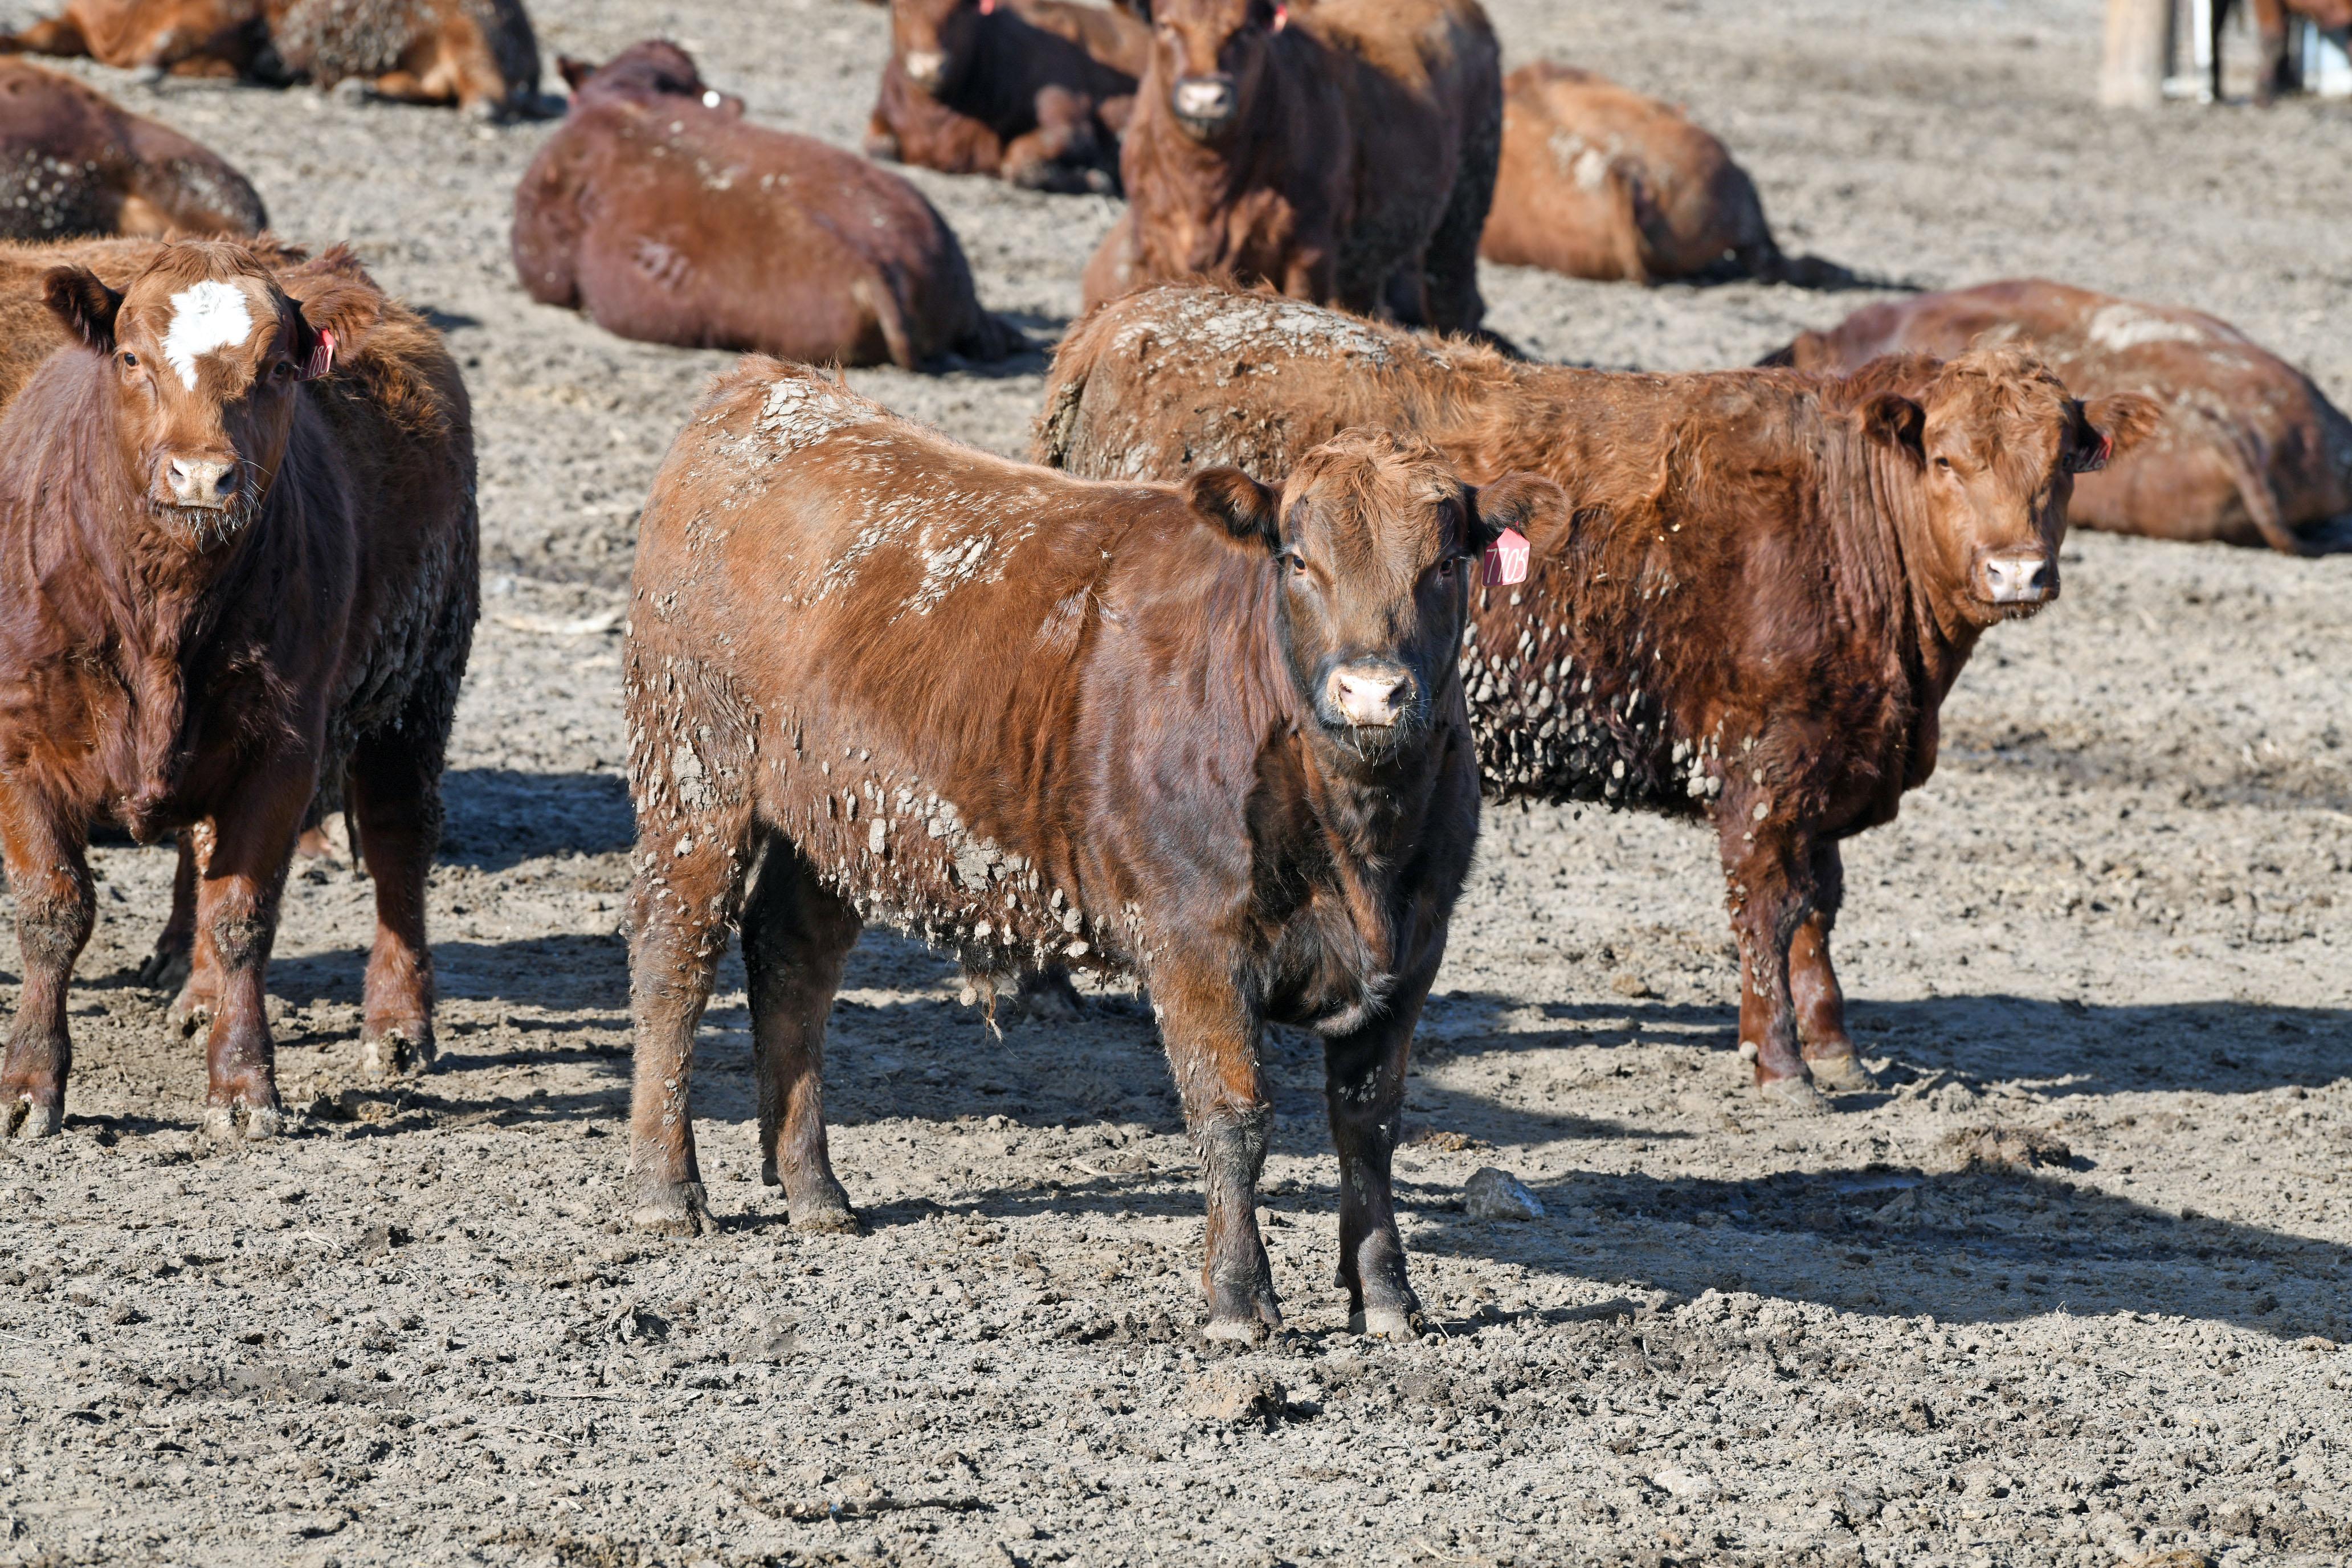 Feedlot steers